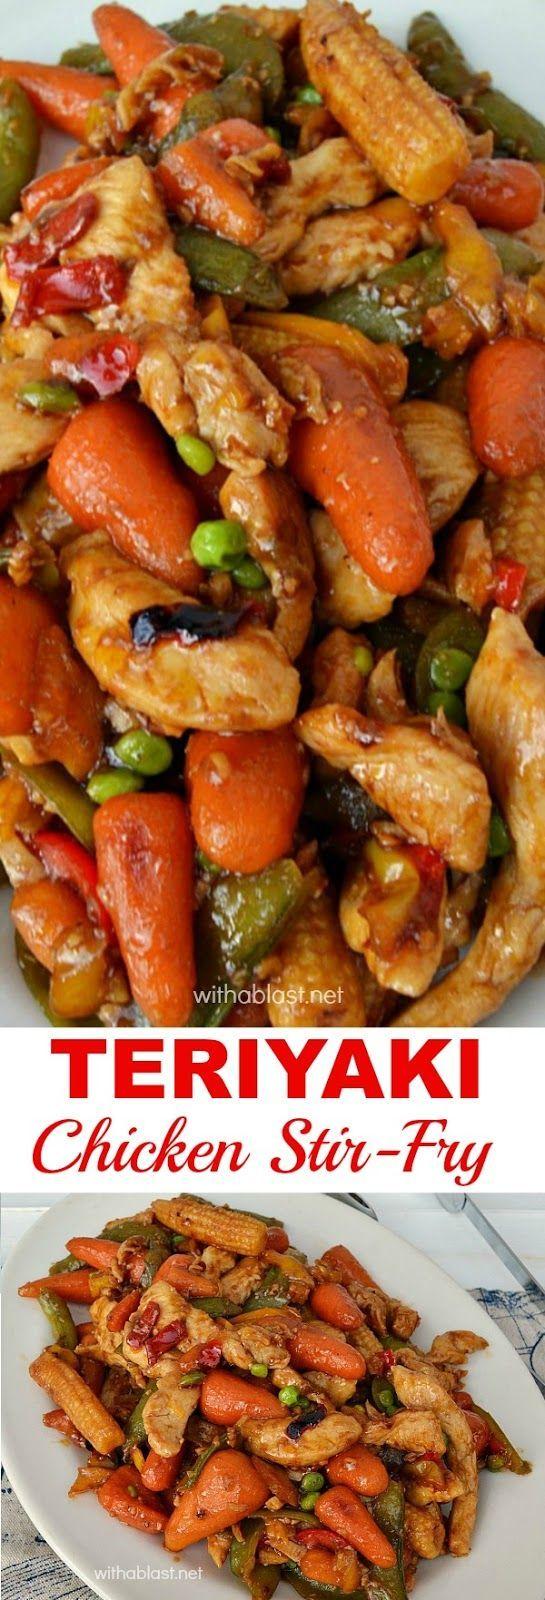 Quick, easy & perfect last minute dinner - Teriyaki Chicken Stir-Fry #chinesefoodrecipes